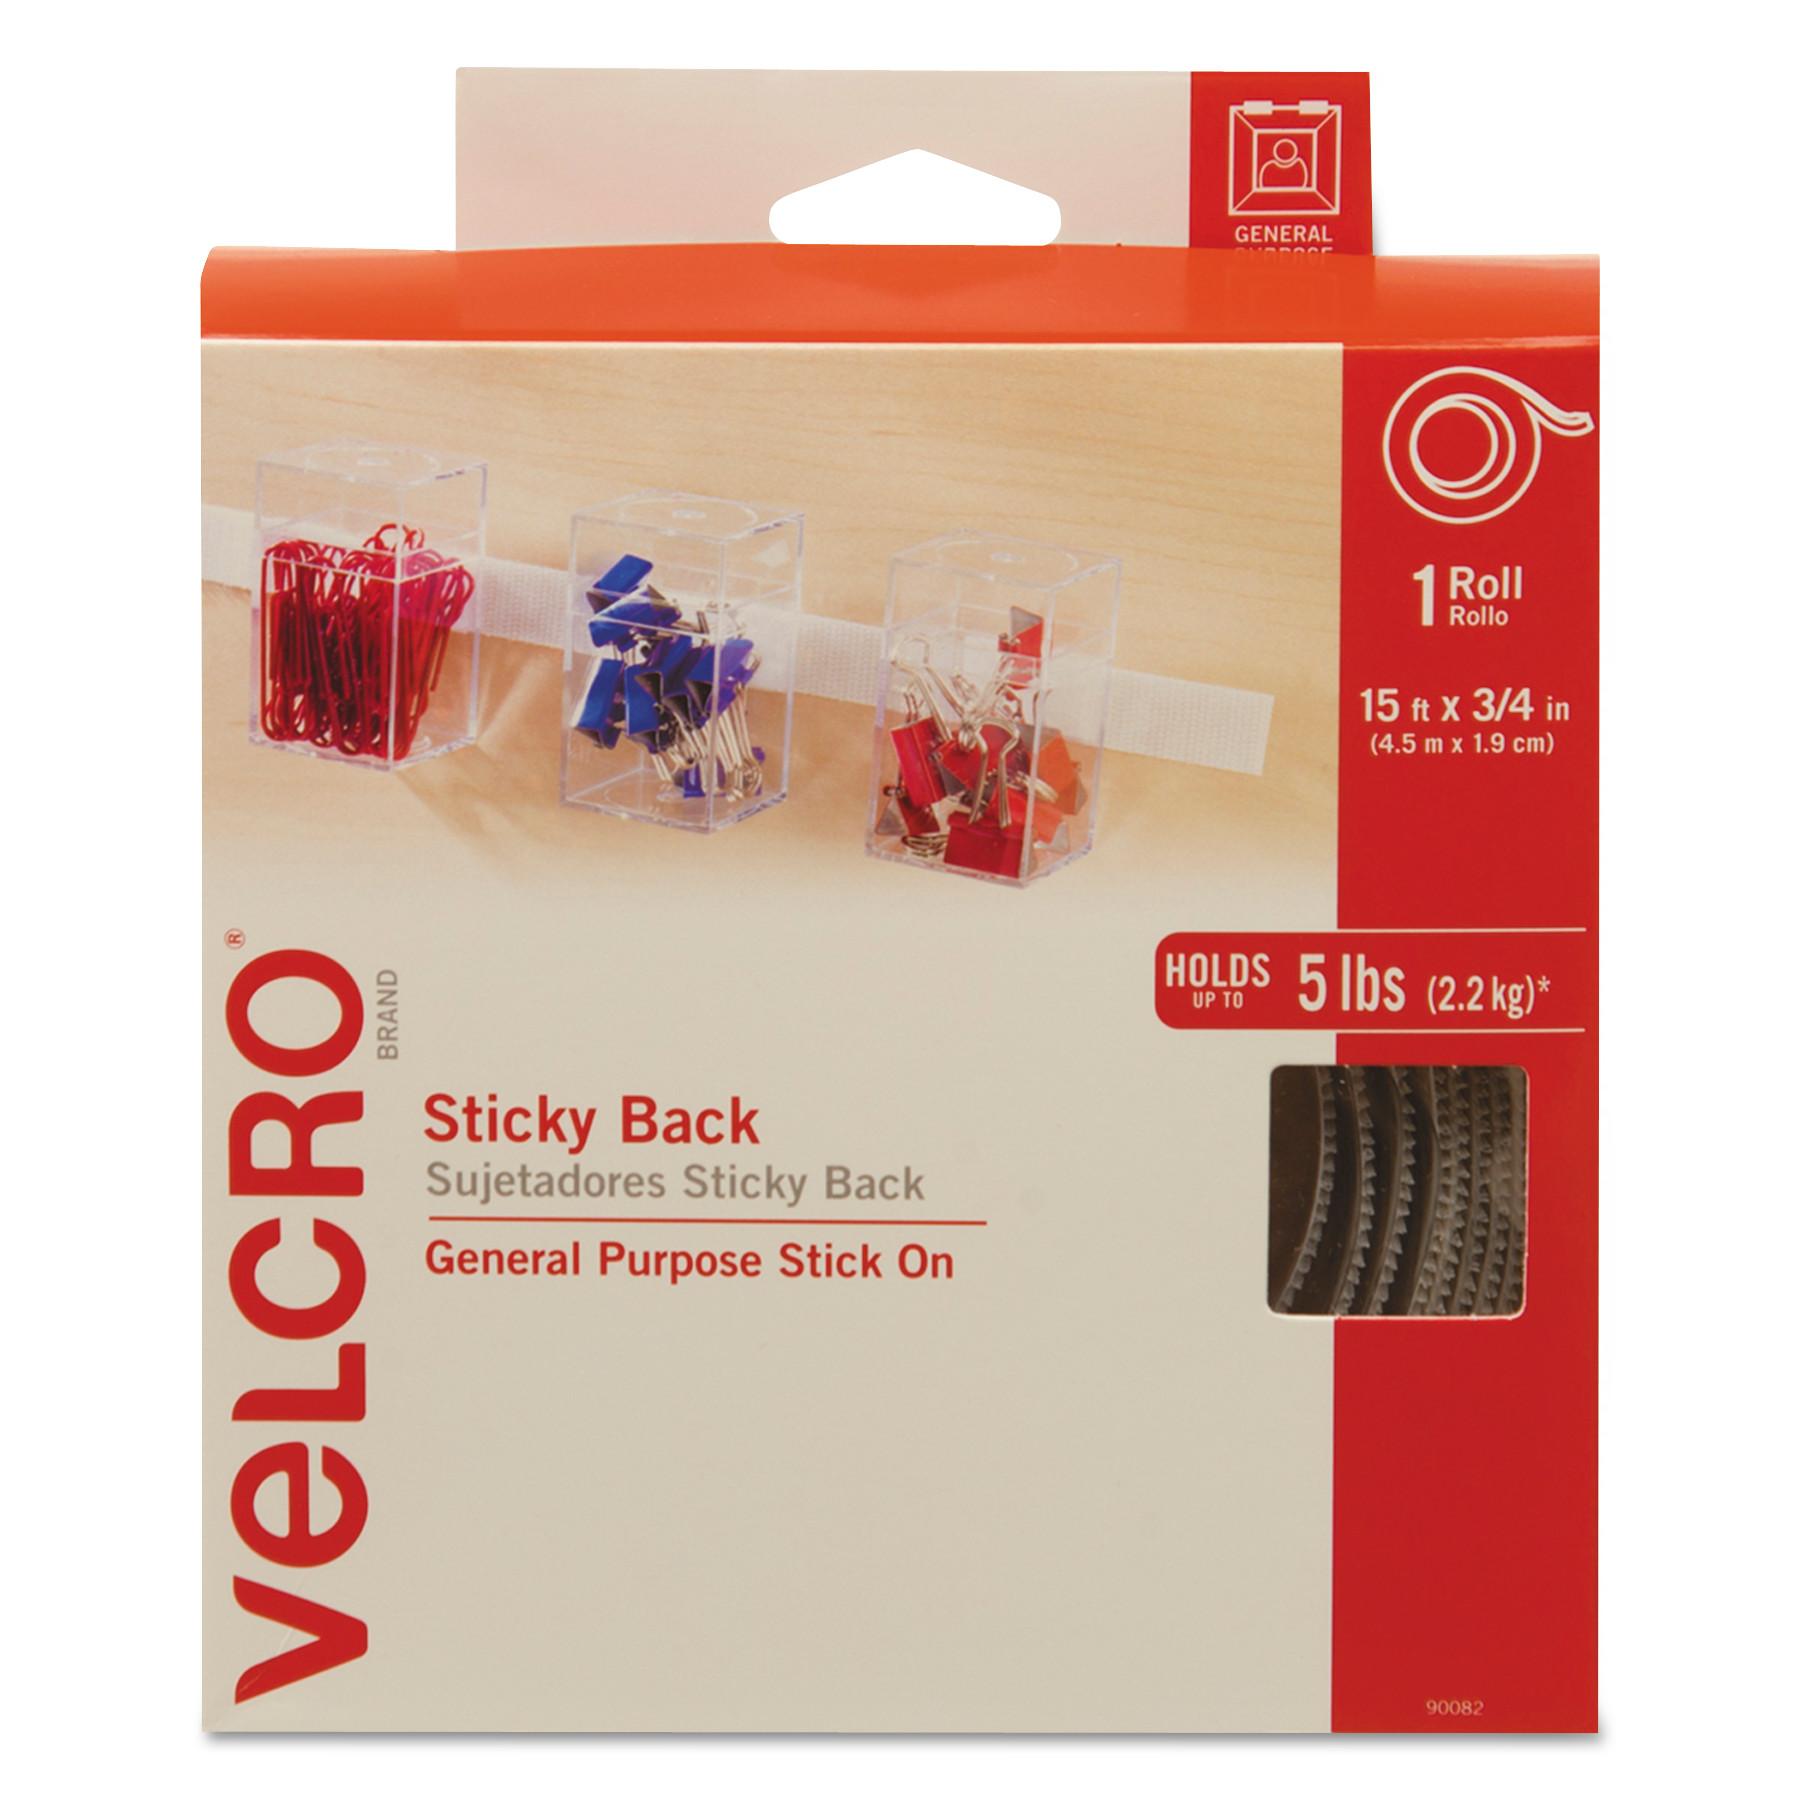 "Velcro Sticky-Back Hook & Loop Fasteners w Dispenser, 3 4"" x 15ft Roll, Black -VEK90081 by VELCRO USA, INC."